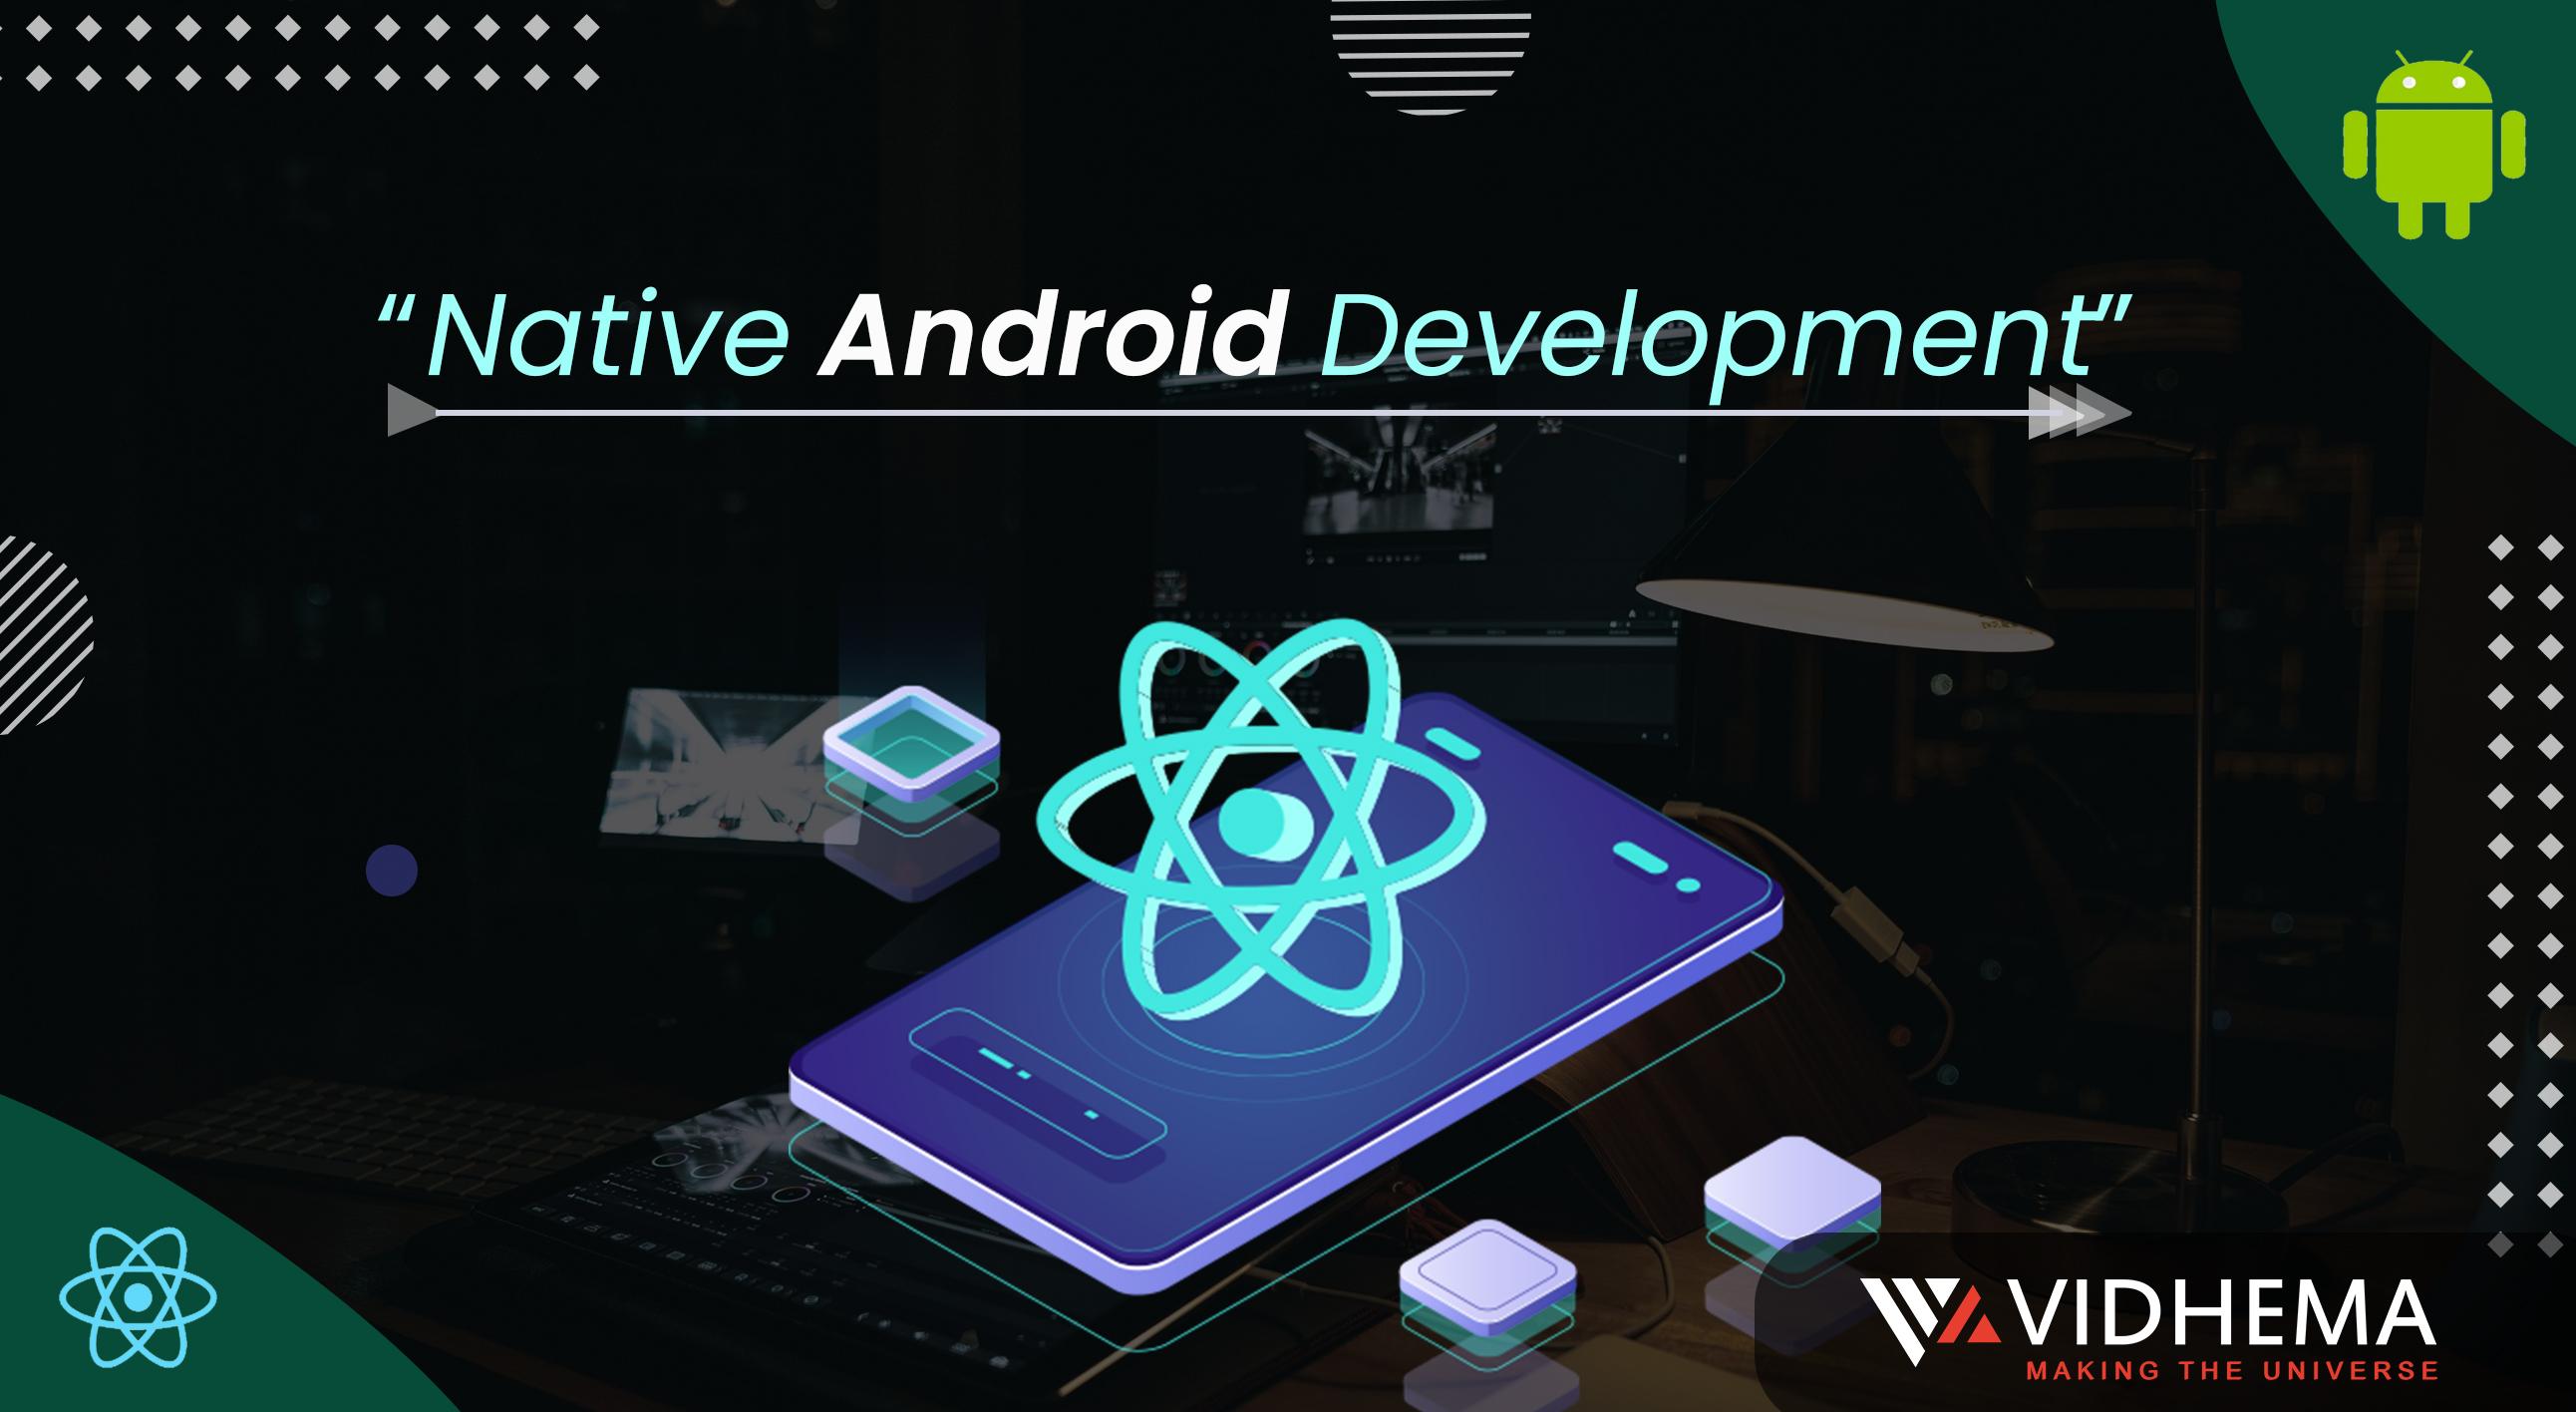 Native Android Development